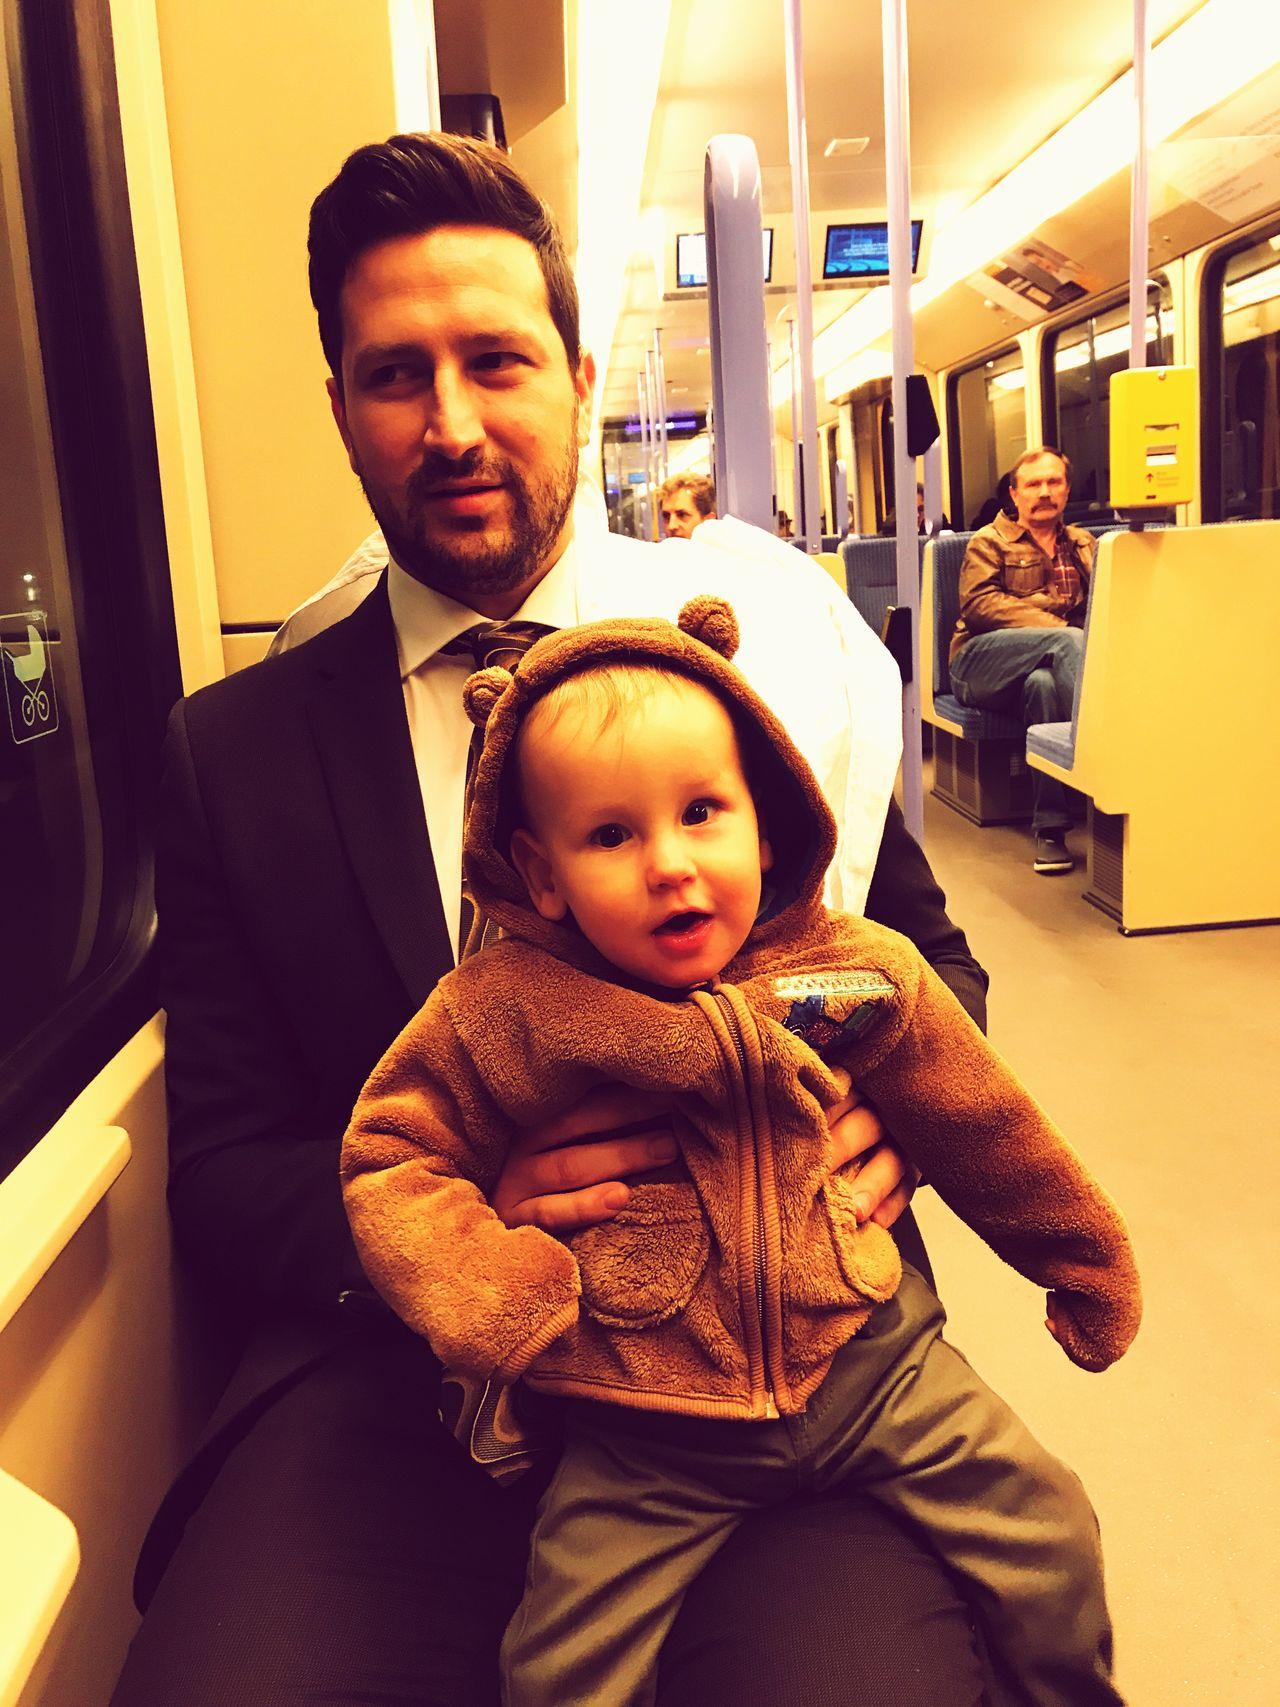 Babybear Metro Vvs Ssb First Eyeem Photo